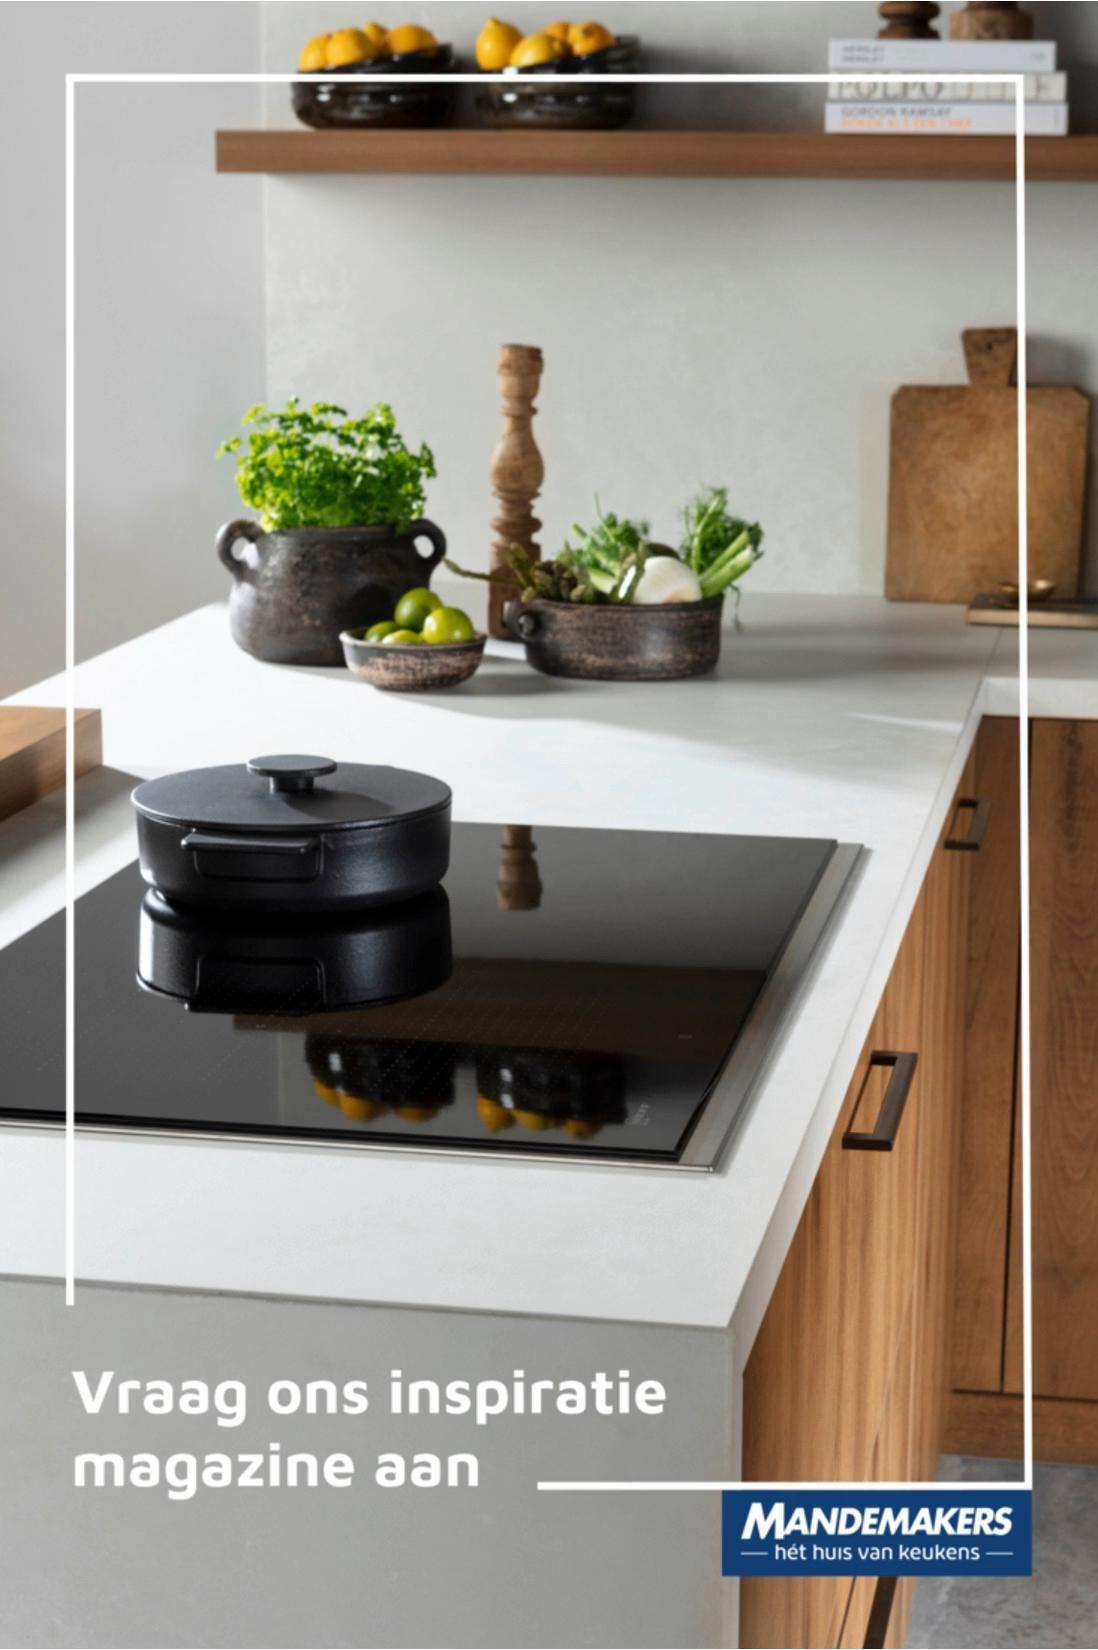 Mandemakers: hét huis van keukens